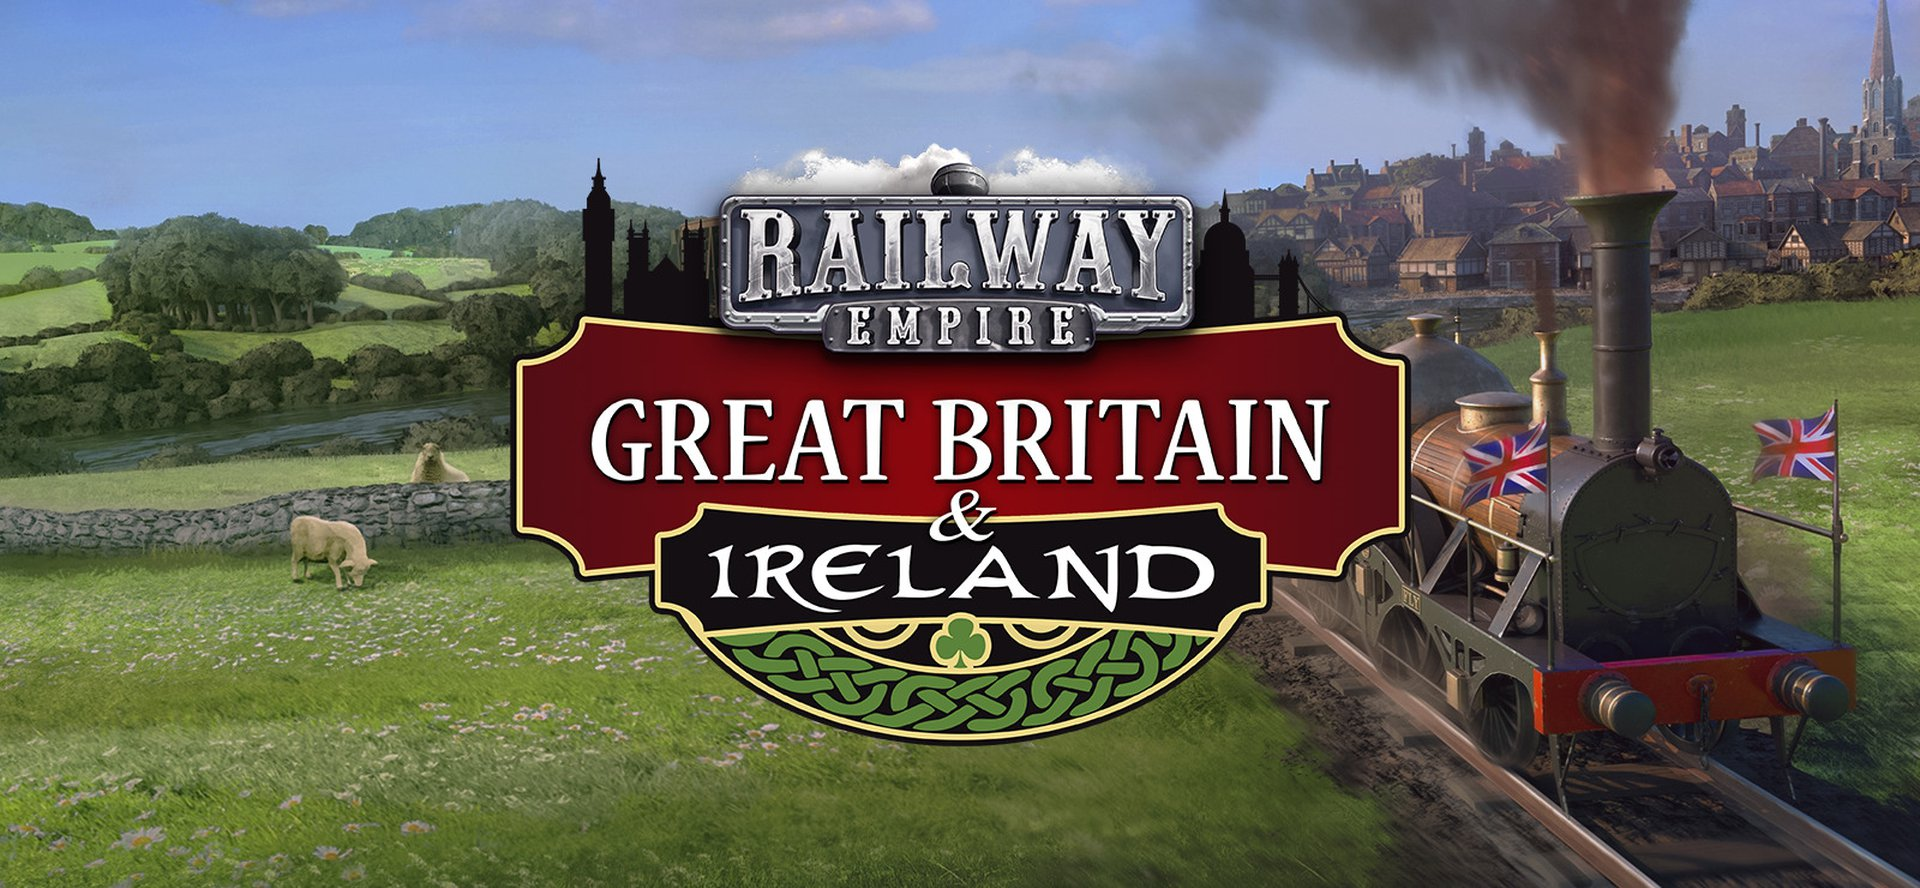 Railway Empire: Great Britain & Ireland